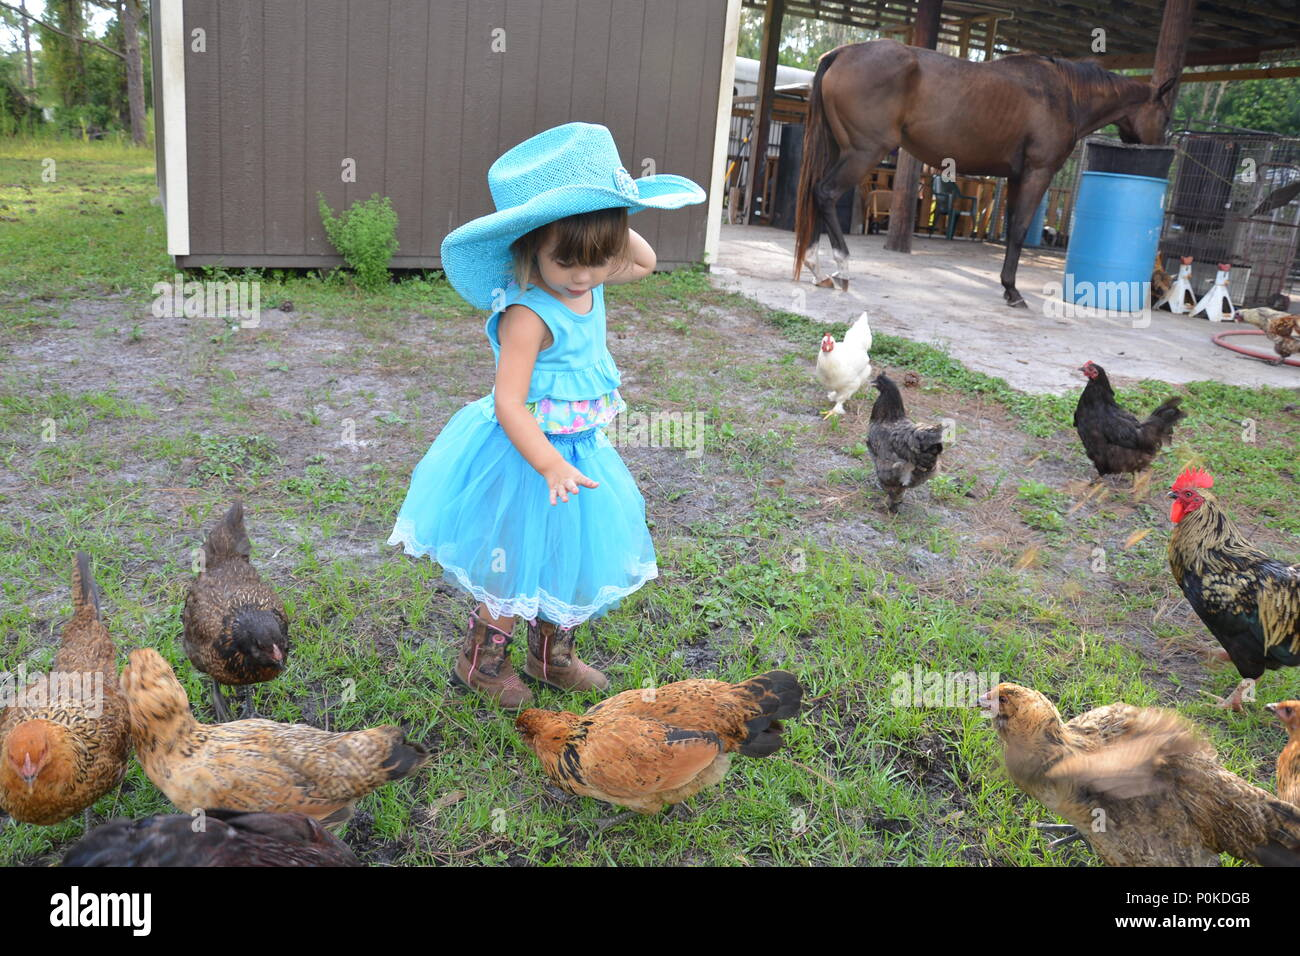 animal farm setting